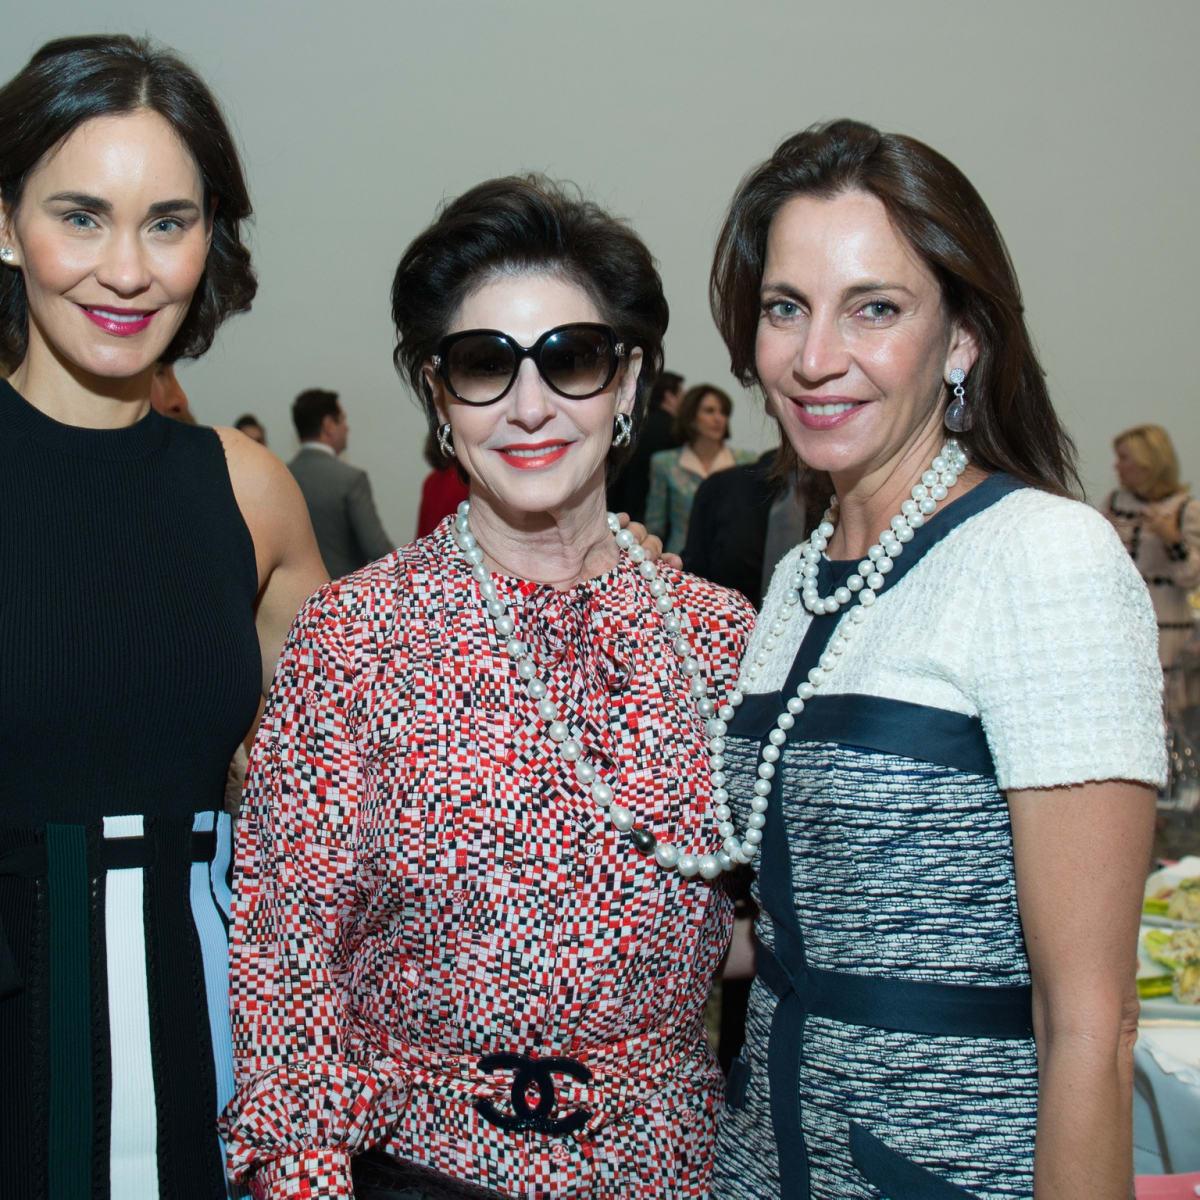 Laura Arnold, Elyse Lanier, Aliyya Stude at Oscar de la Renta fashion show at MFAH